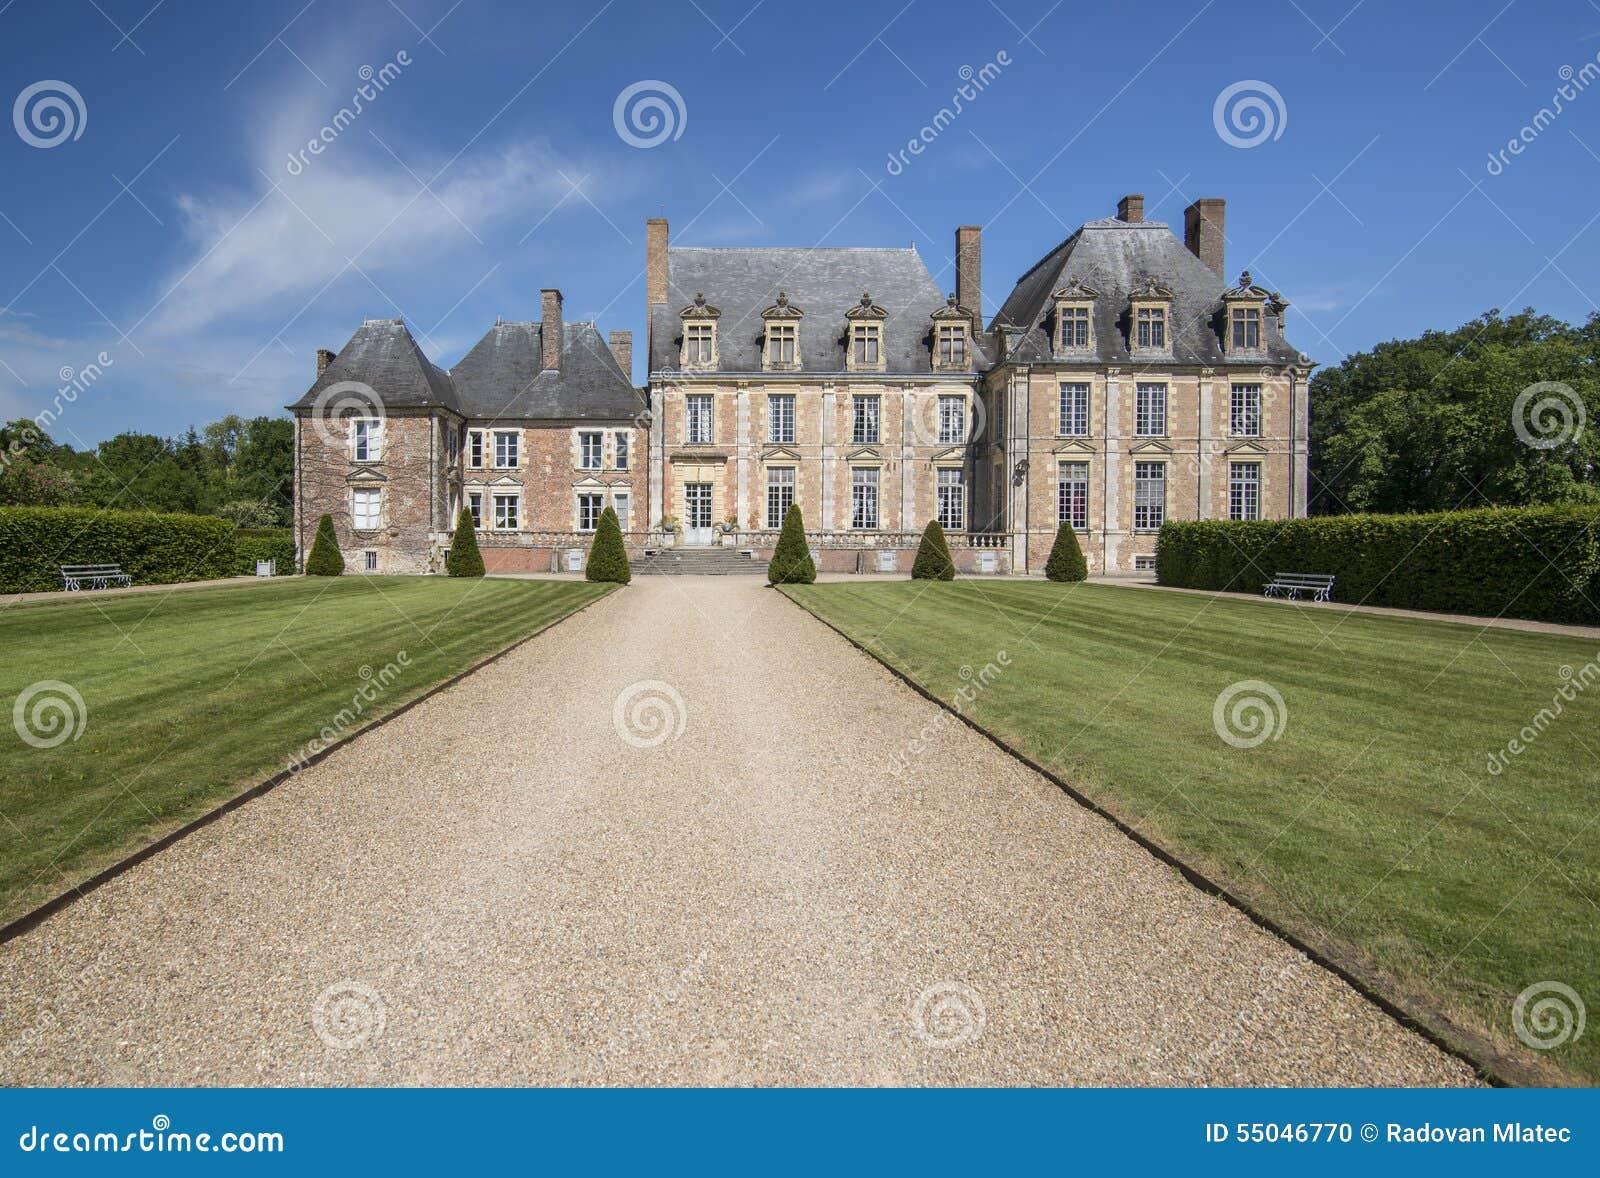 Castle of of de la Ferte Saint-Aubin